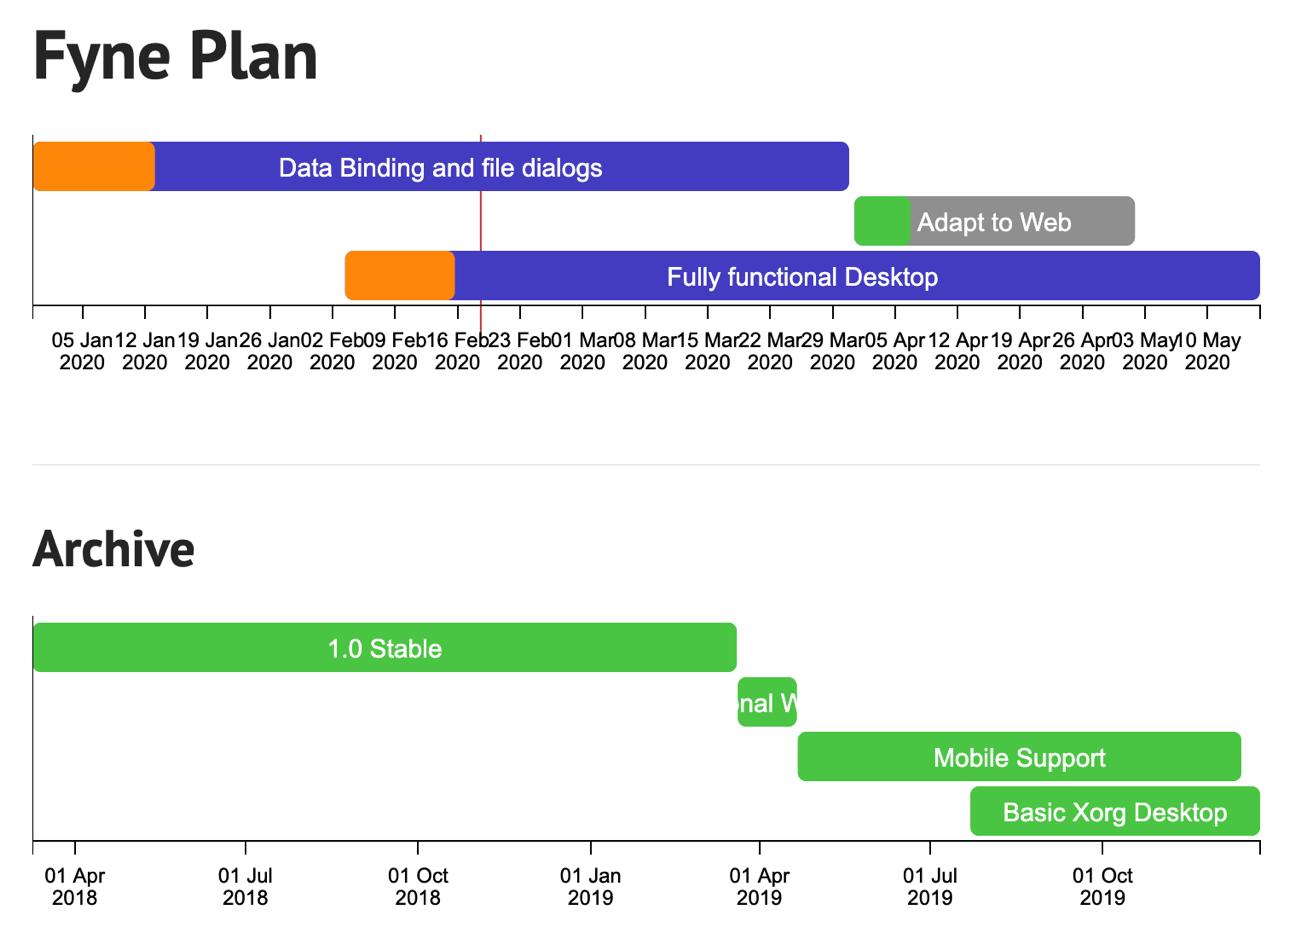 Fyne's Roadmap Visualized